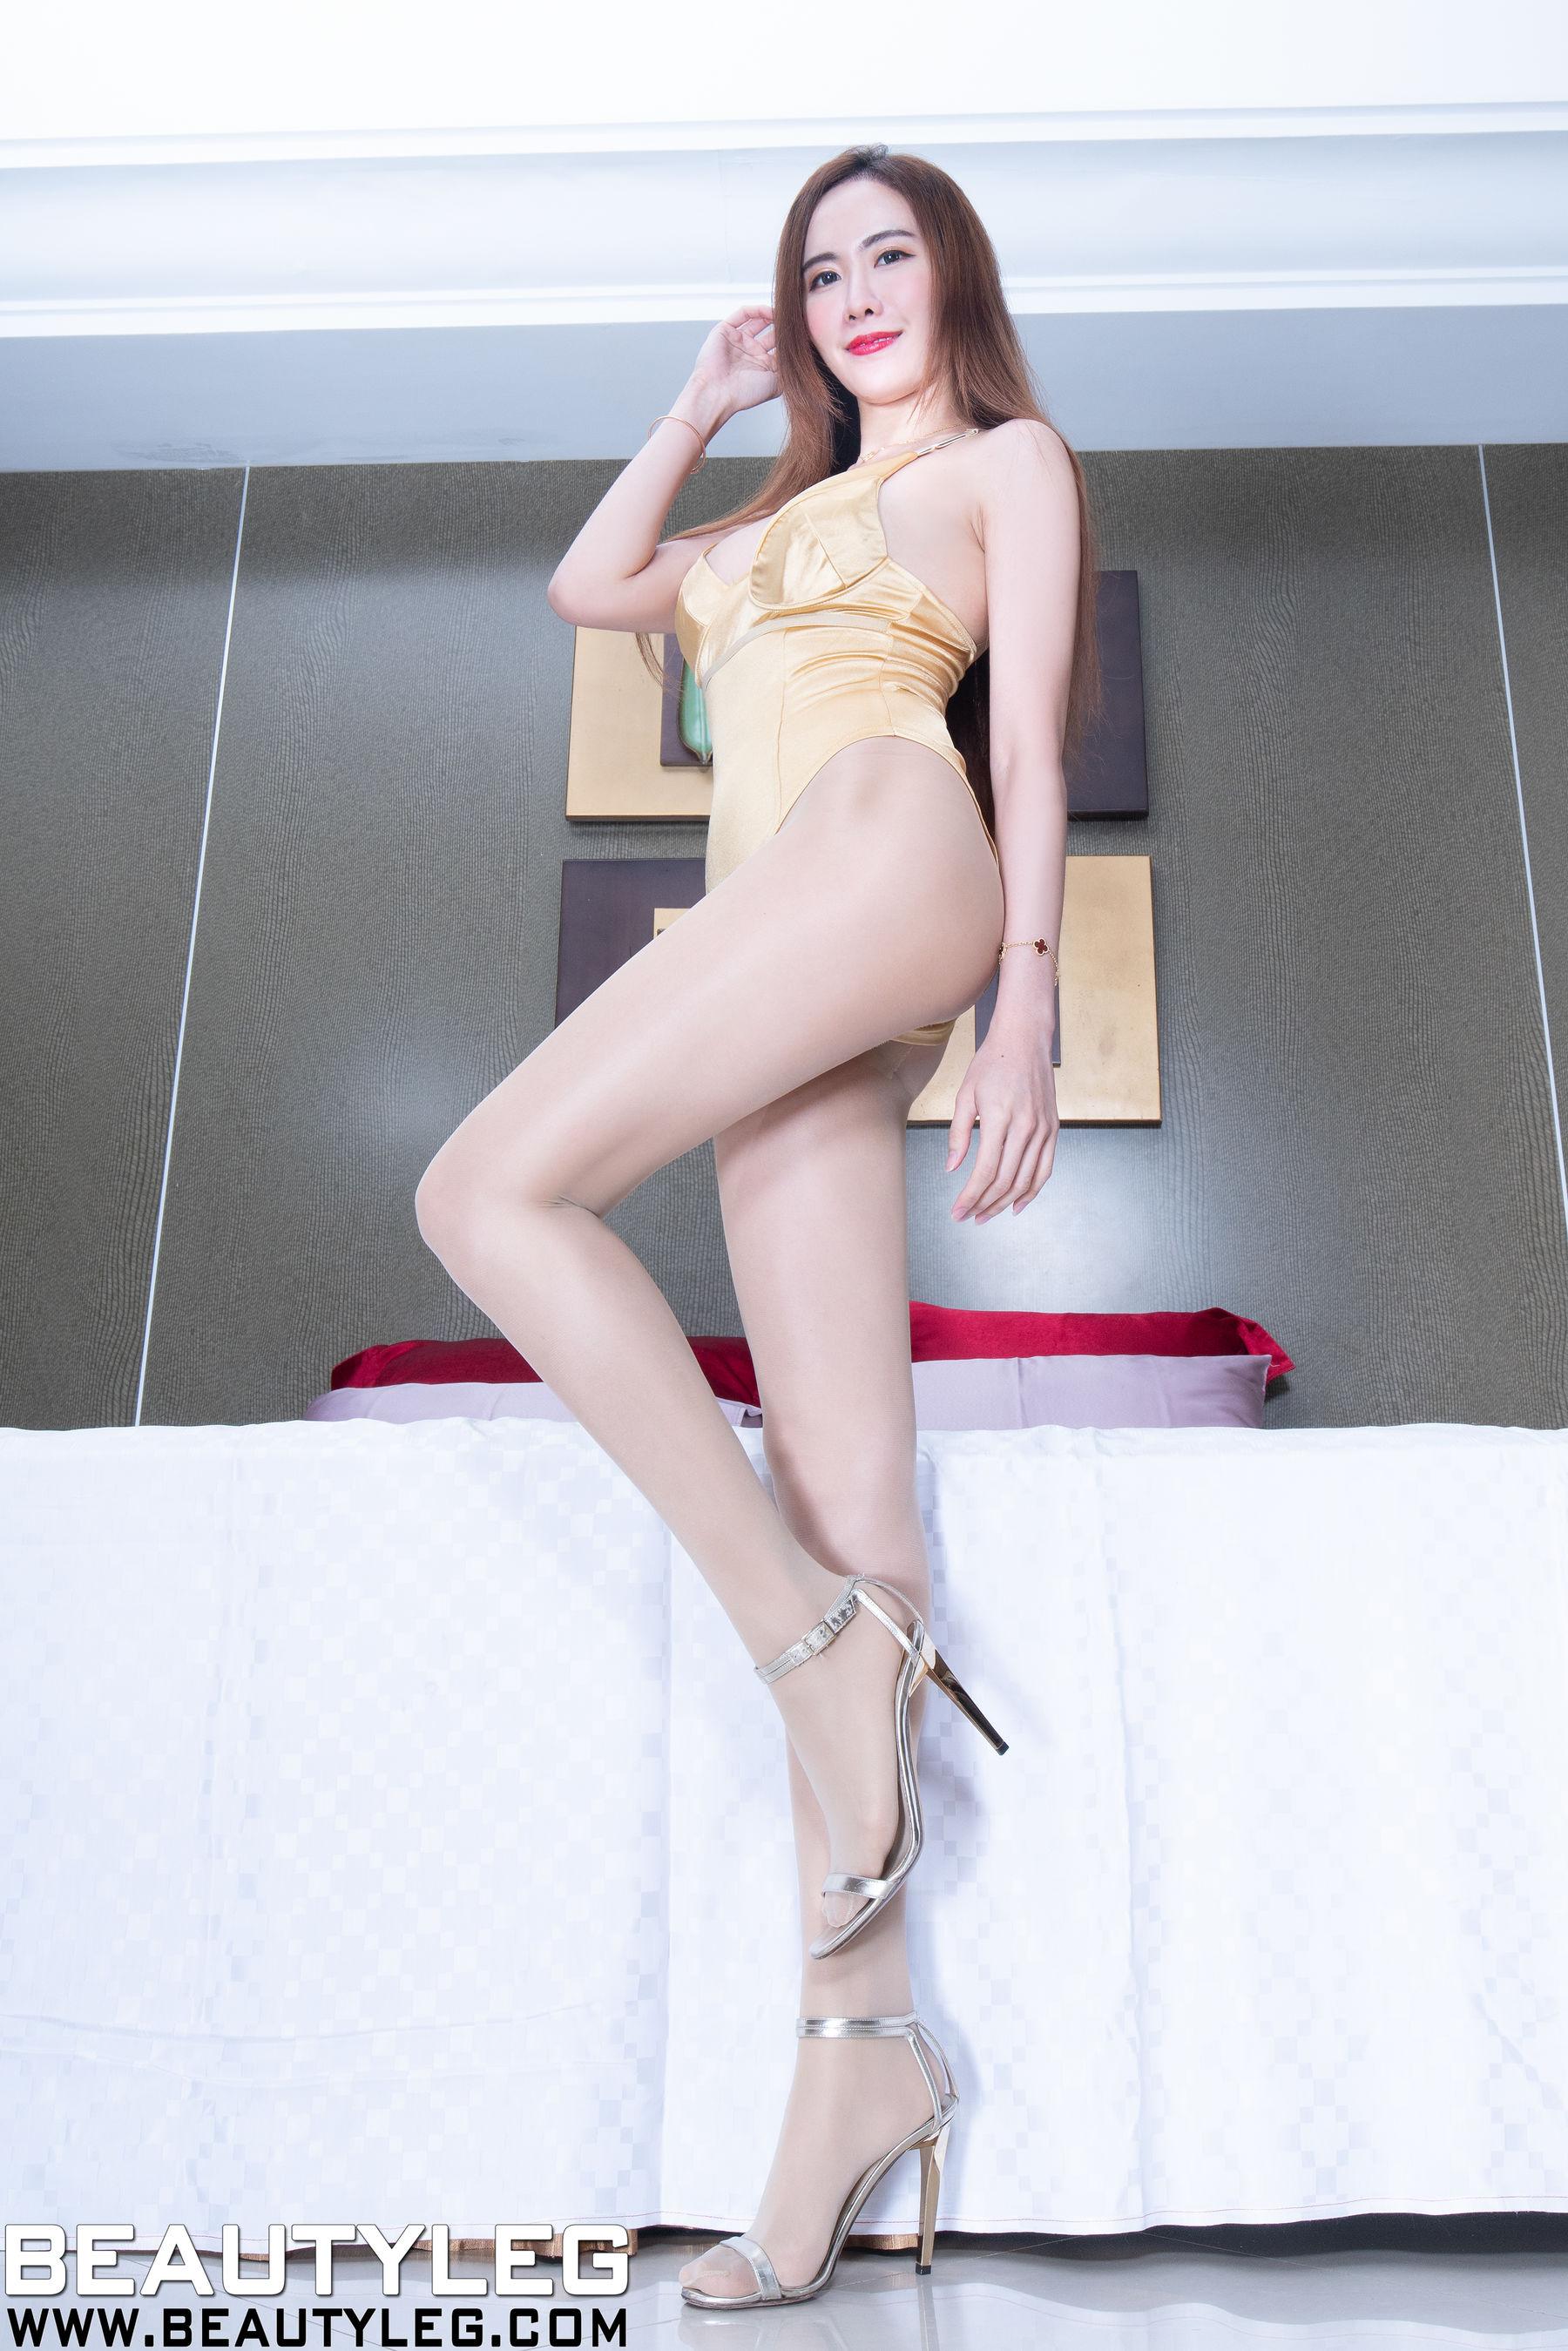 VOL.217 [Beautyleg]丝袜美腿高跟:曾妍希(腿模Dora)超高清个人性感漂亮大图(63P)